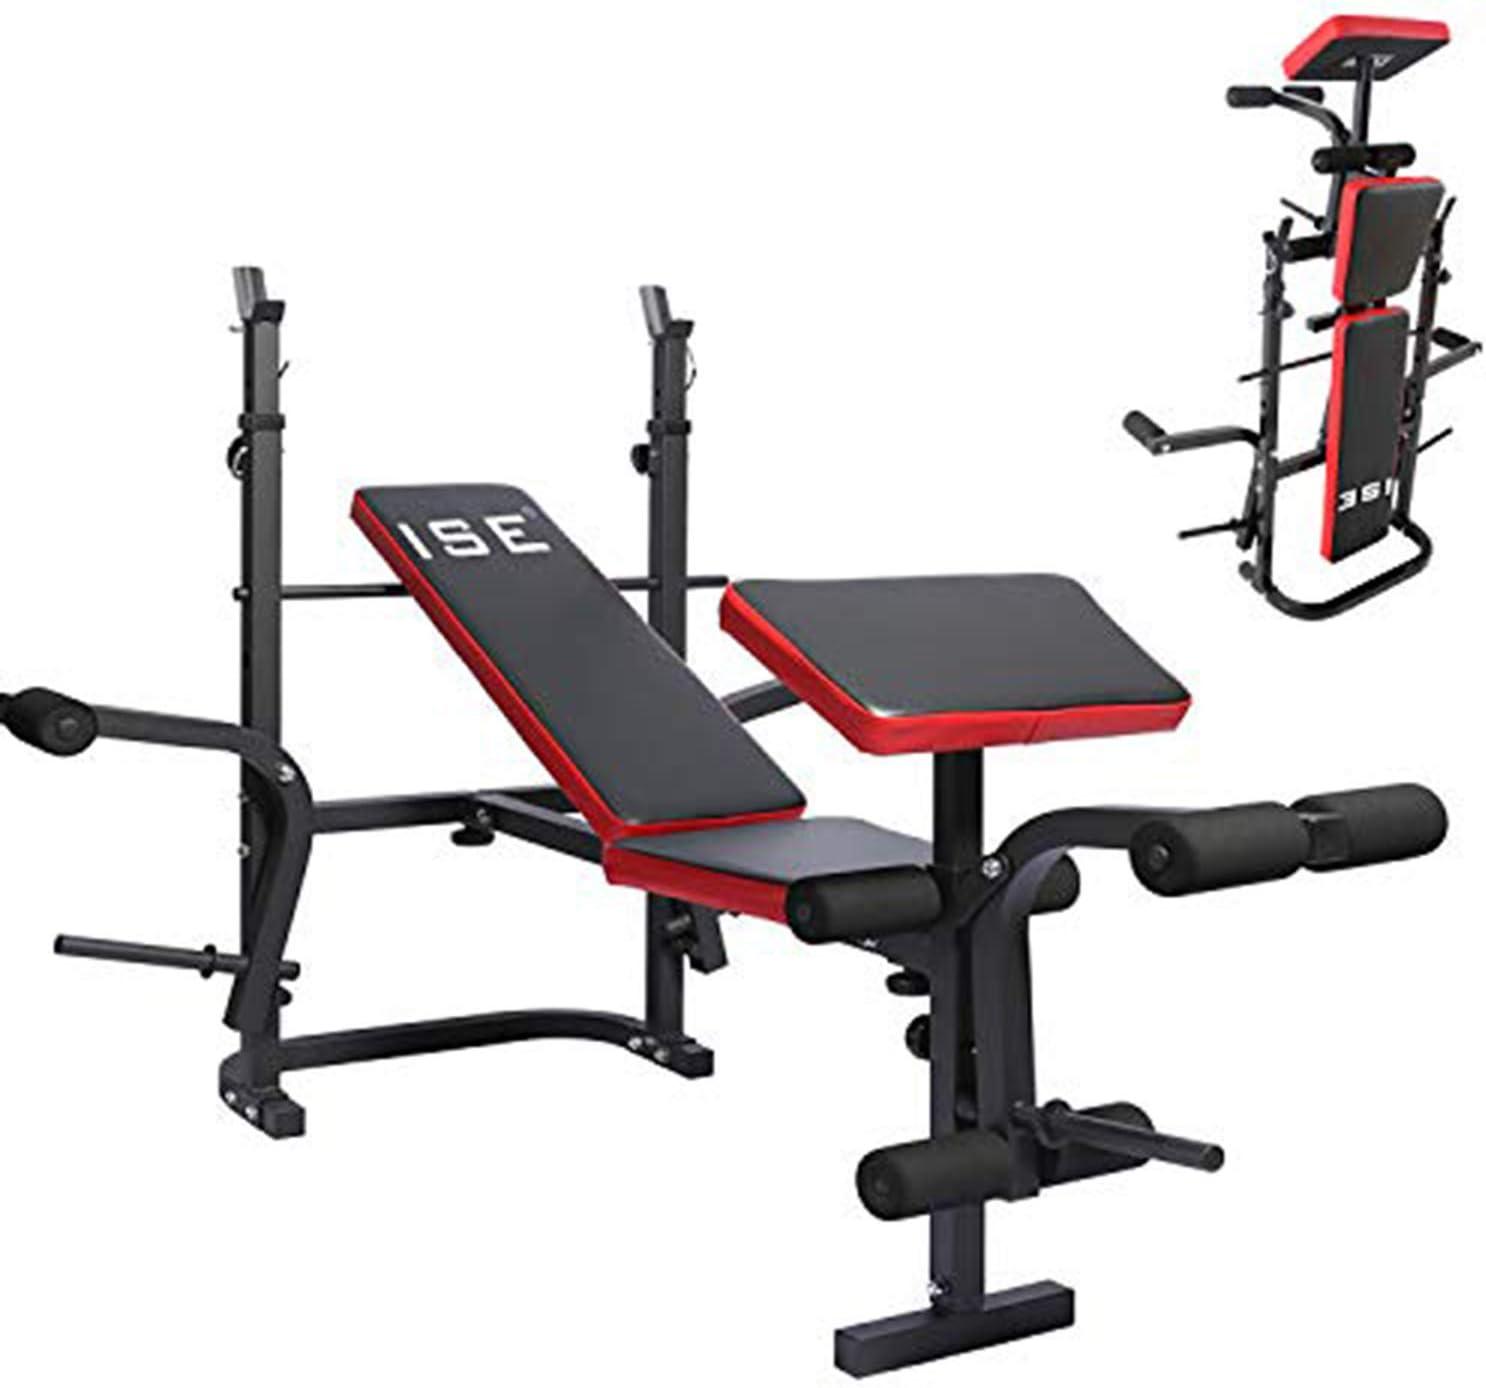 R/ückenlehne in 6 Positionen verstellbar Fitness max Multifunktions-Training Trainingsbank neigbar SY-5021 ISE Faltbare Hantelbank 120 kg